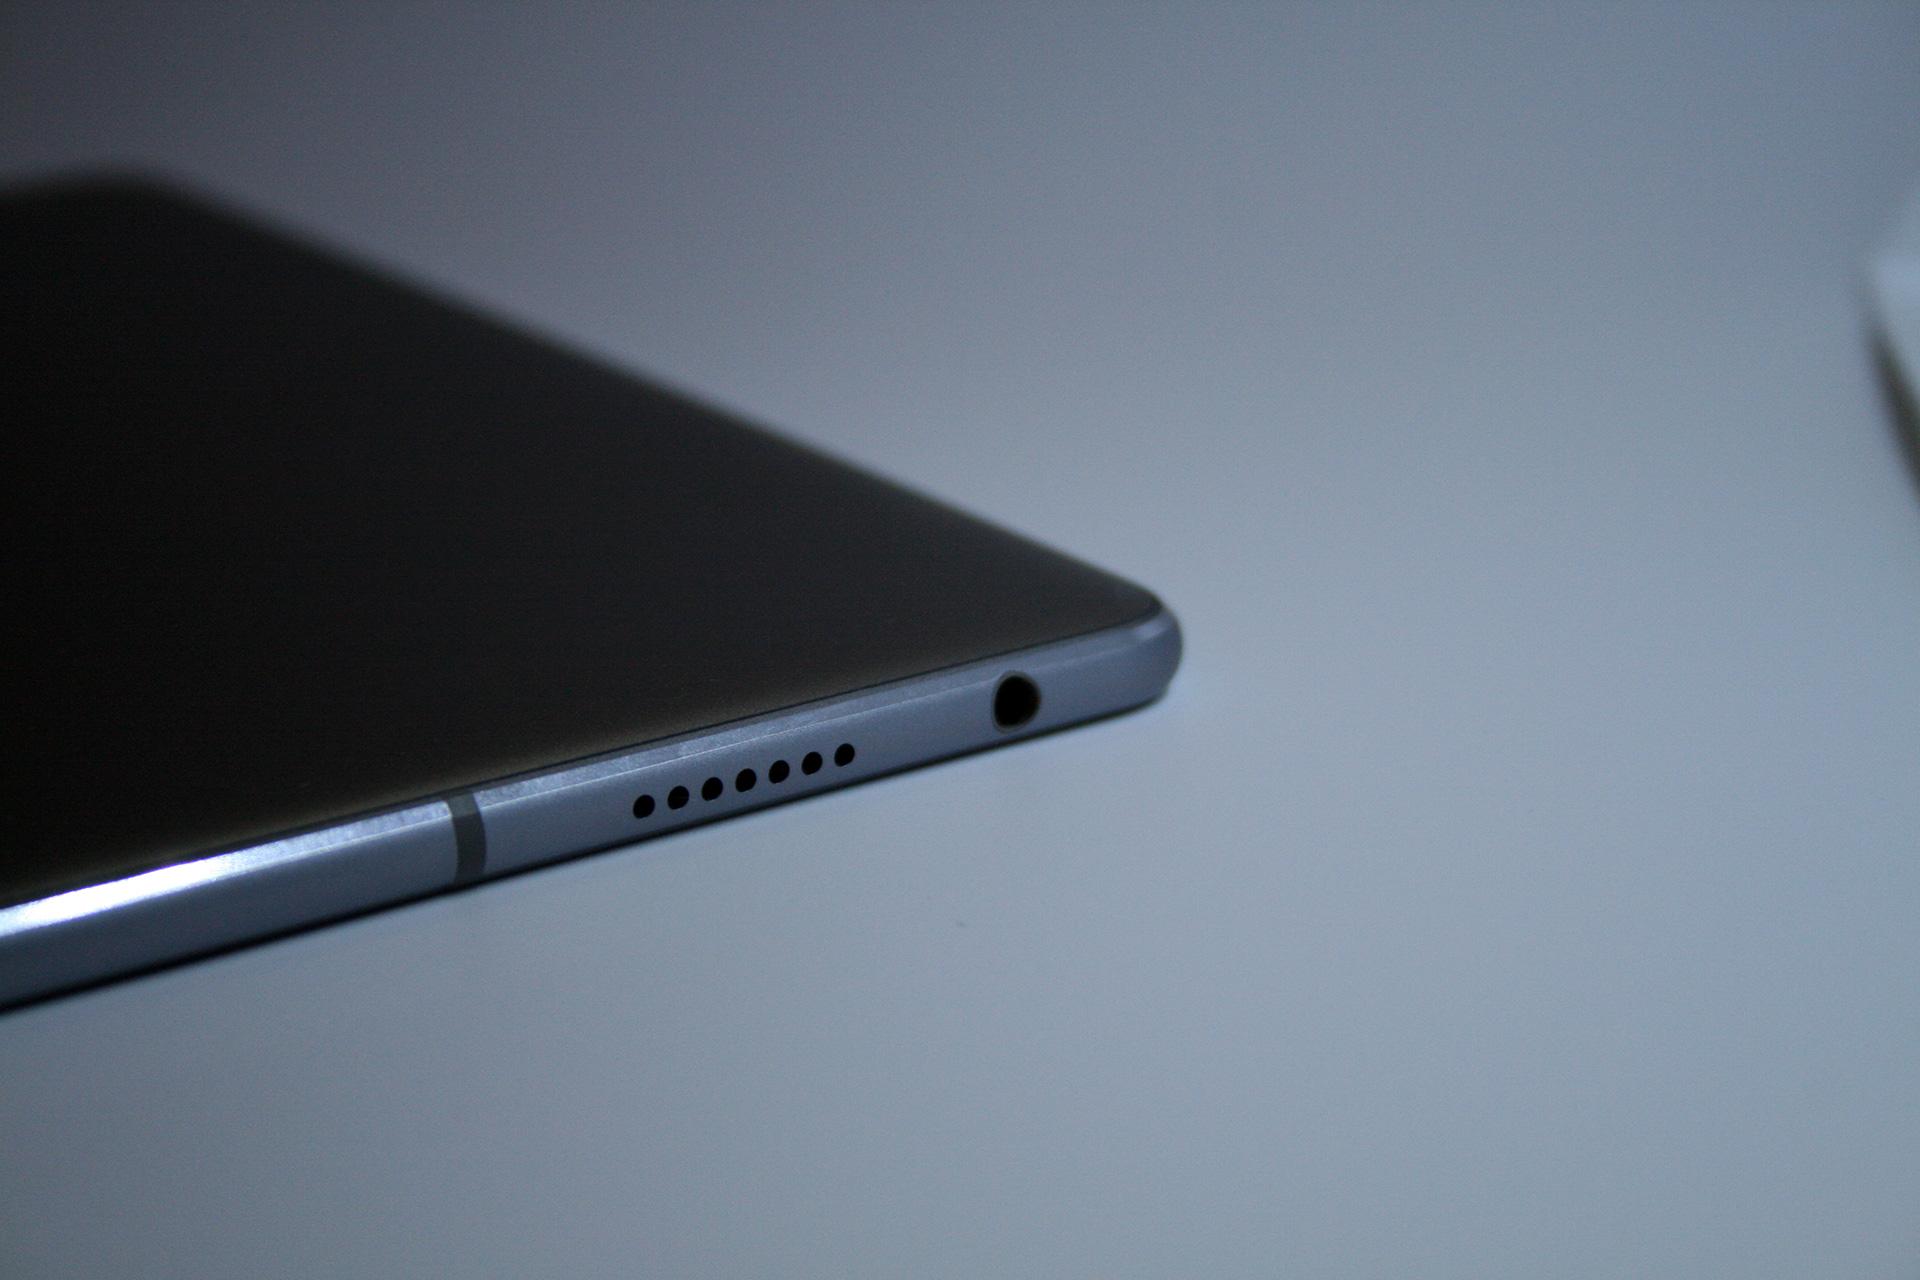 Обзор планшета Huawei MediaPad M3 Lite 10